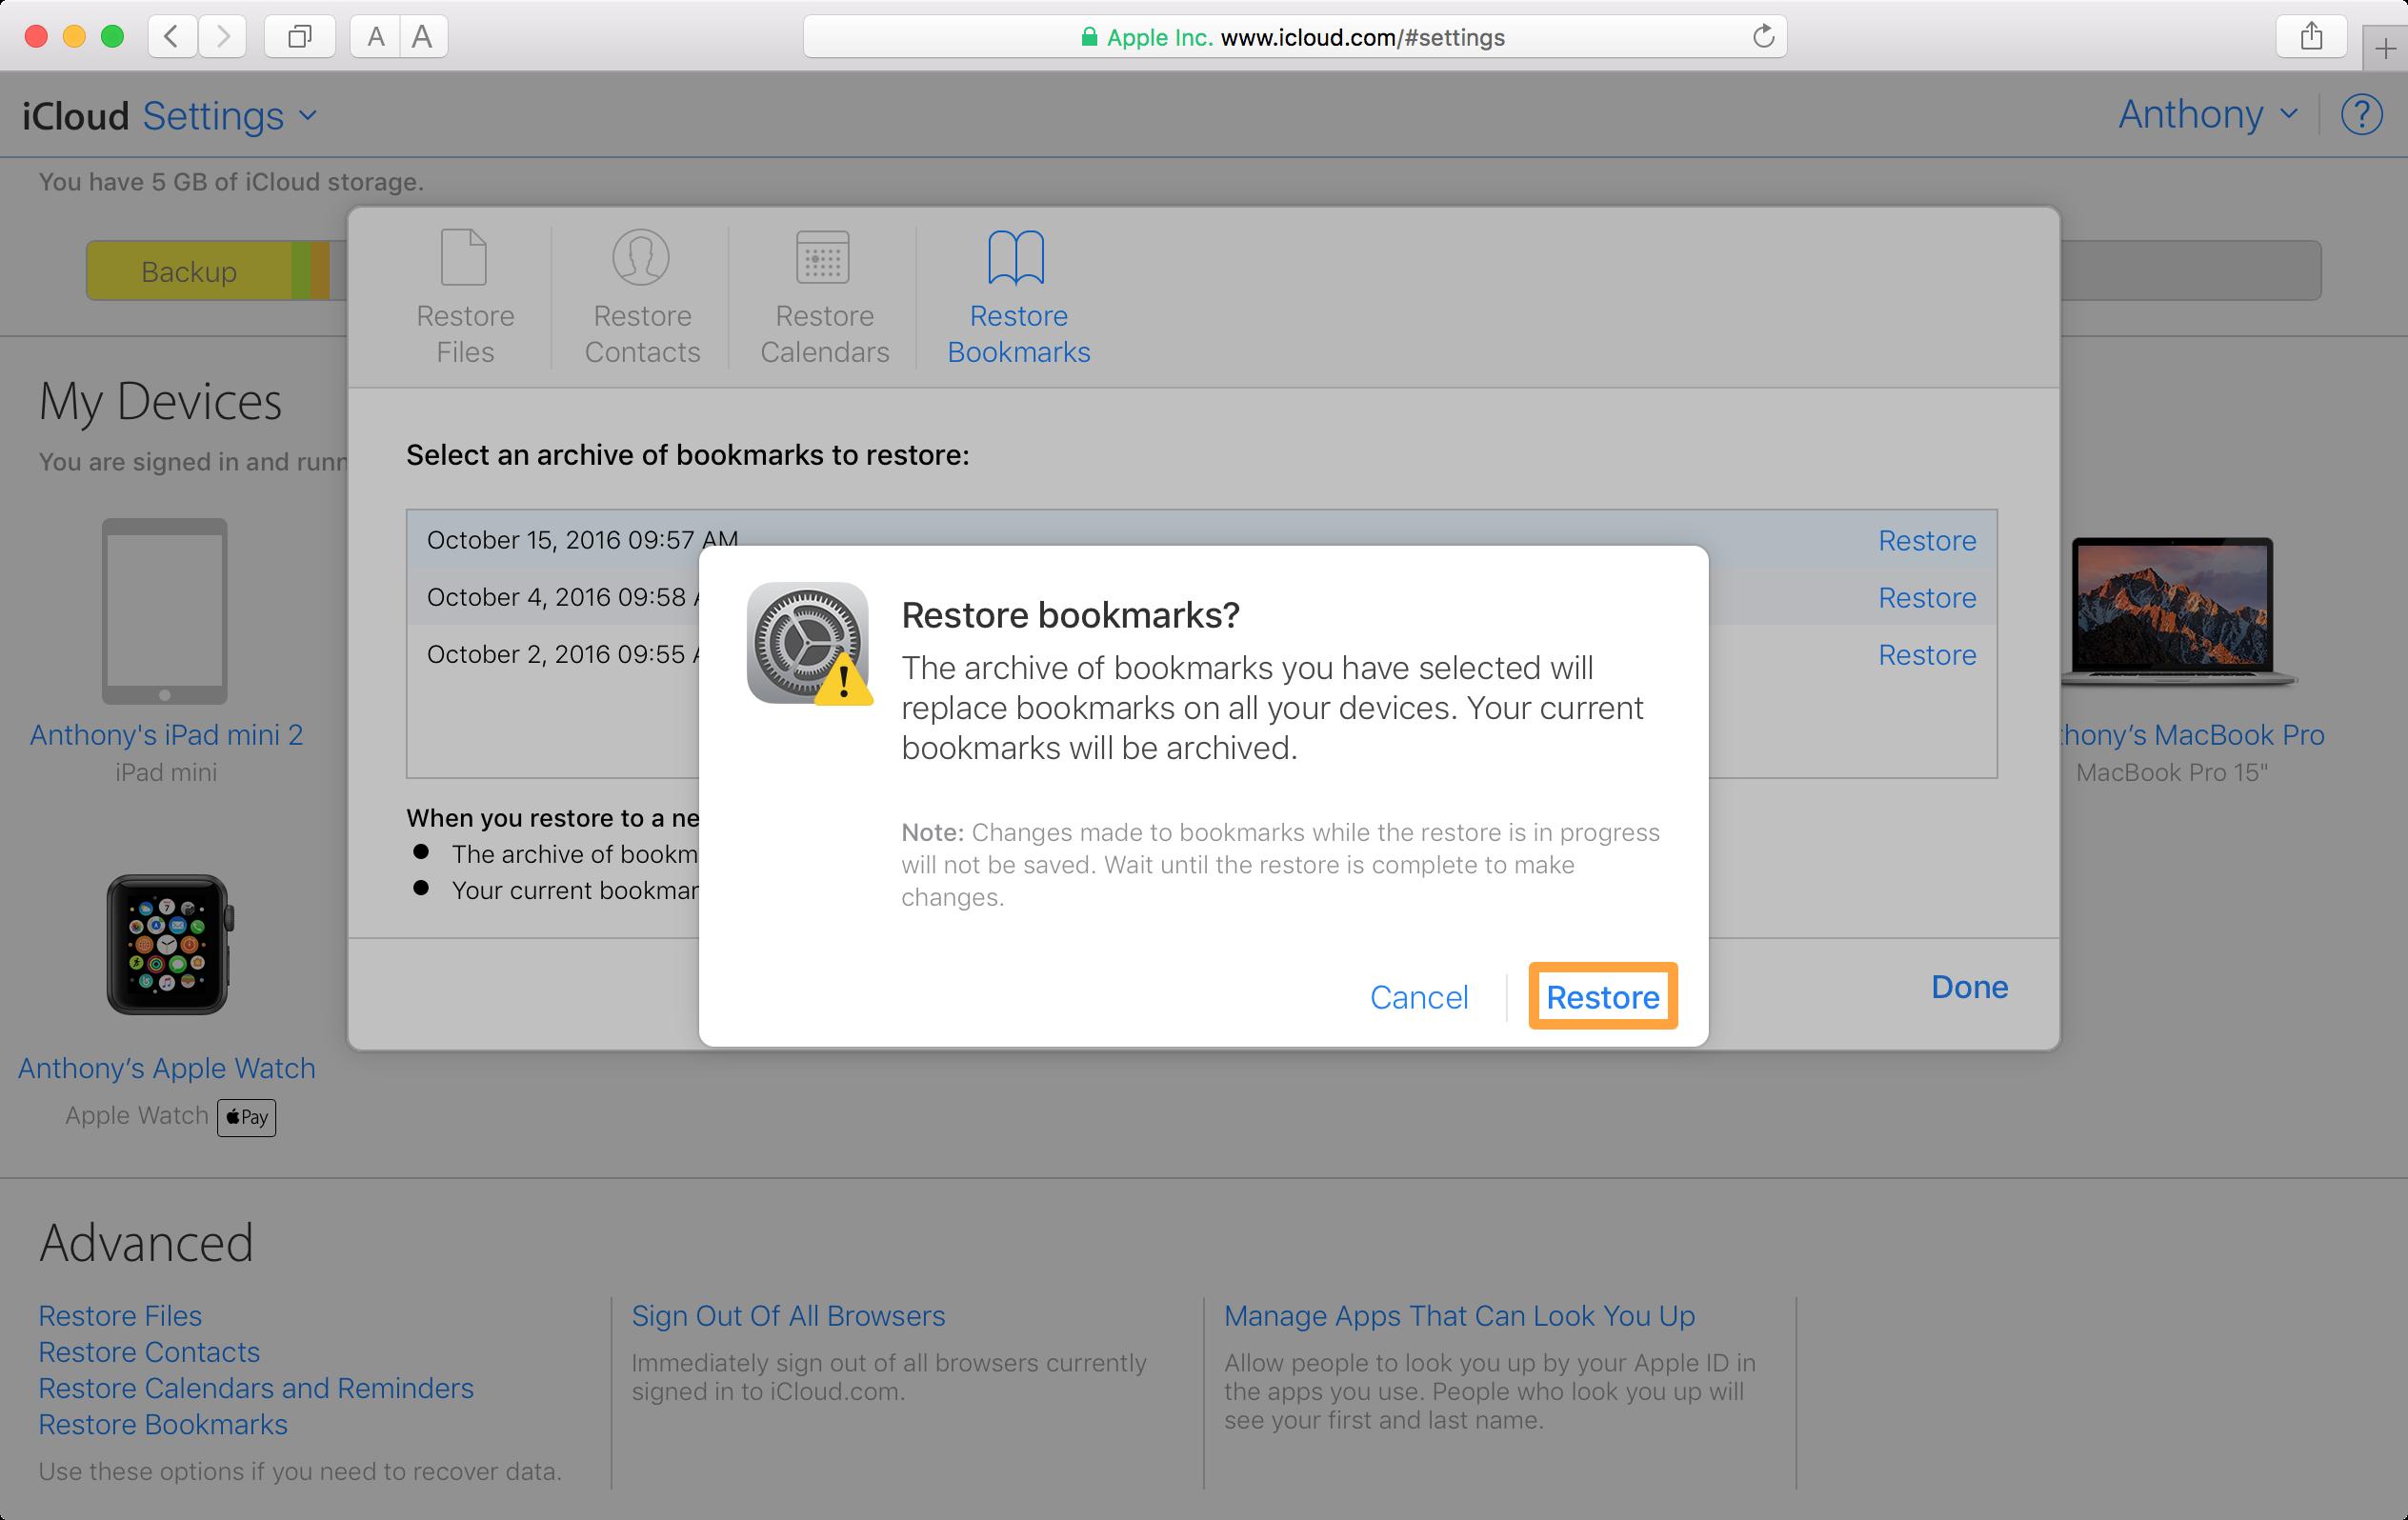 iCloud Restore Bookmarks Prompt